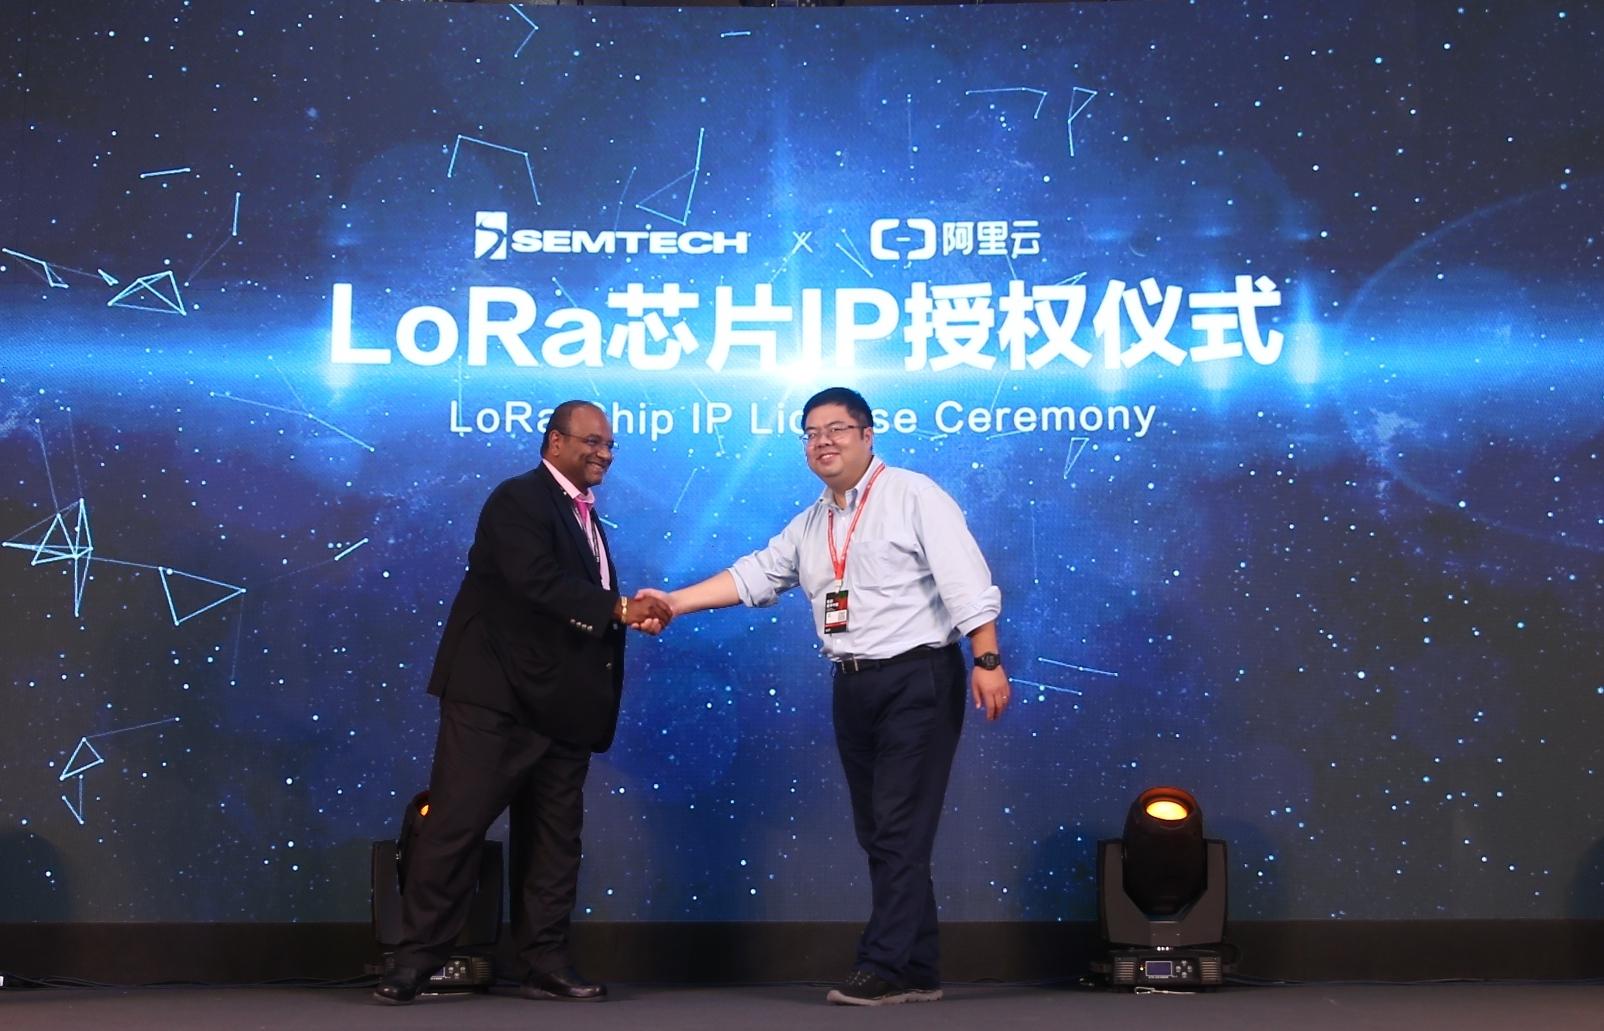 LoRa芯片IP授权仪式